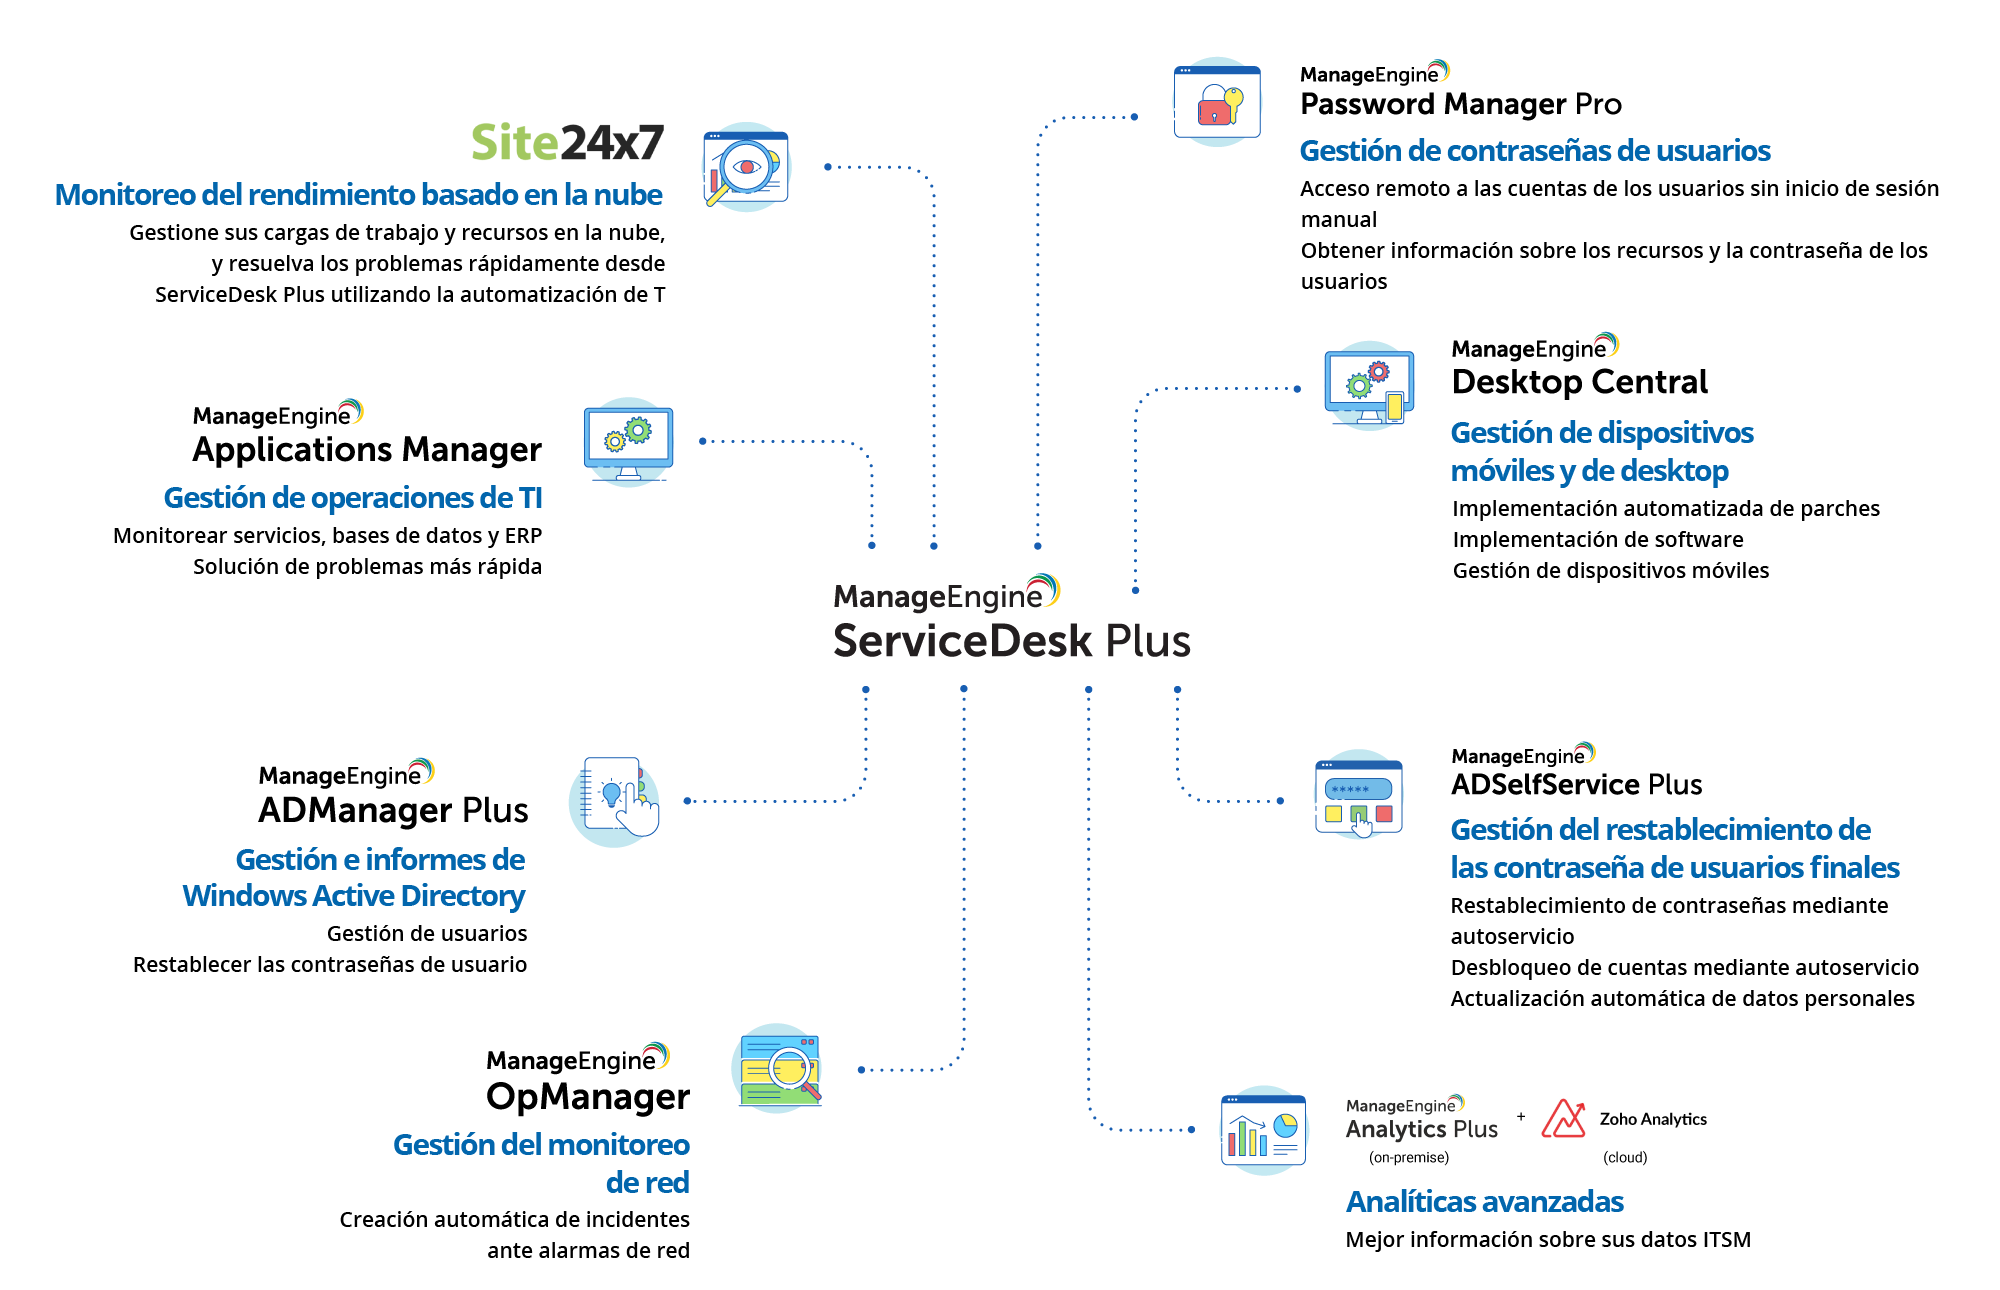 Service desk native integrations workflow